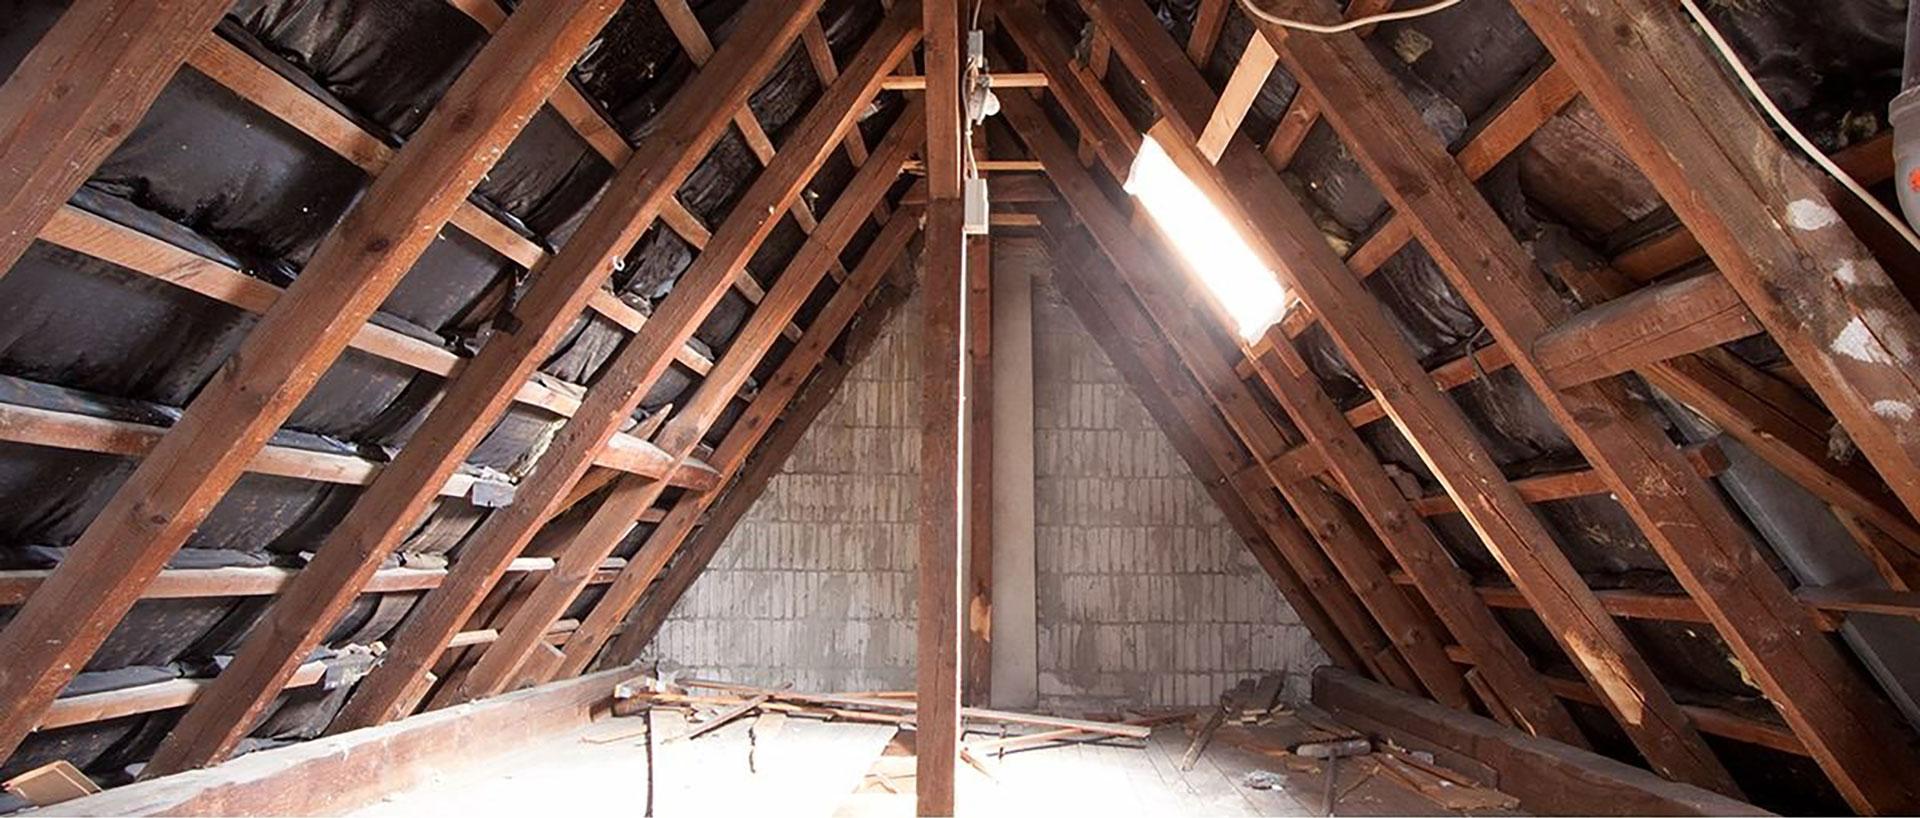 Dachbodenausbau vorher